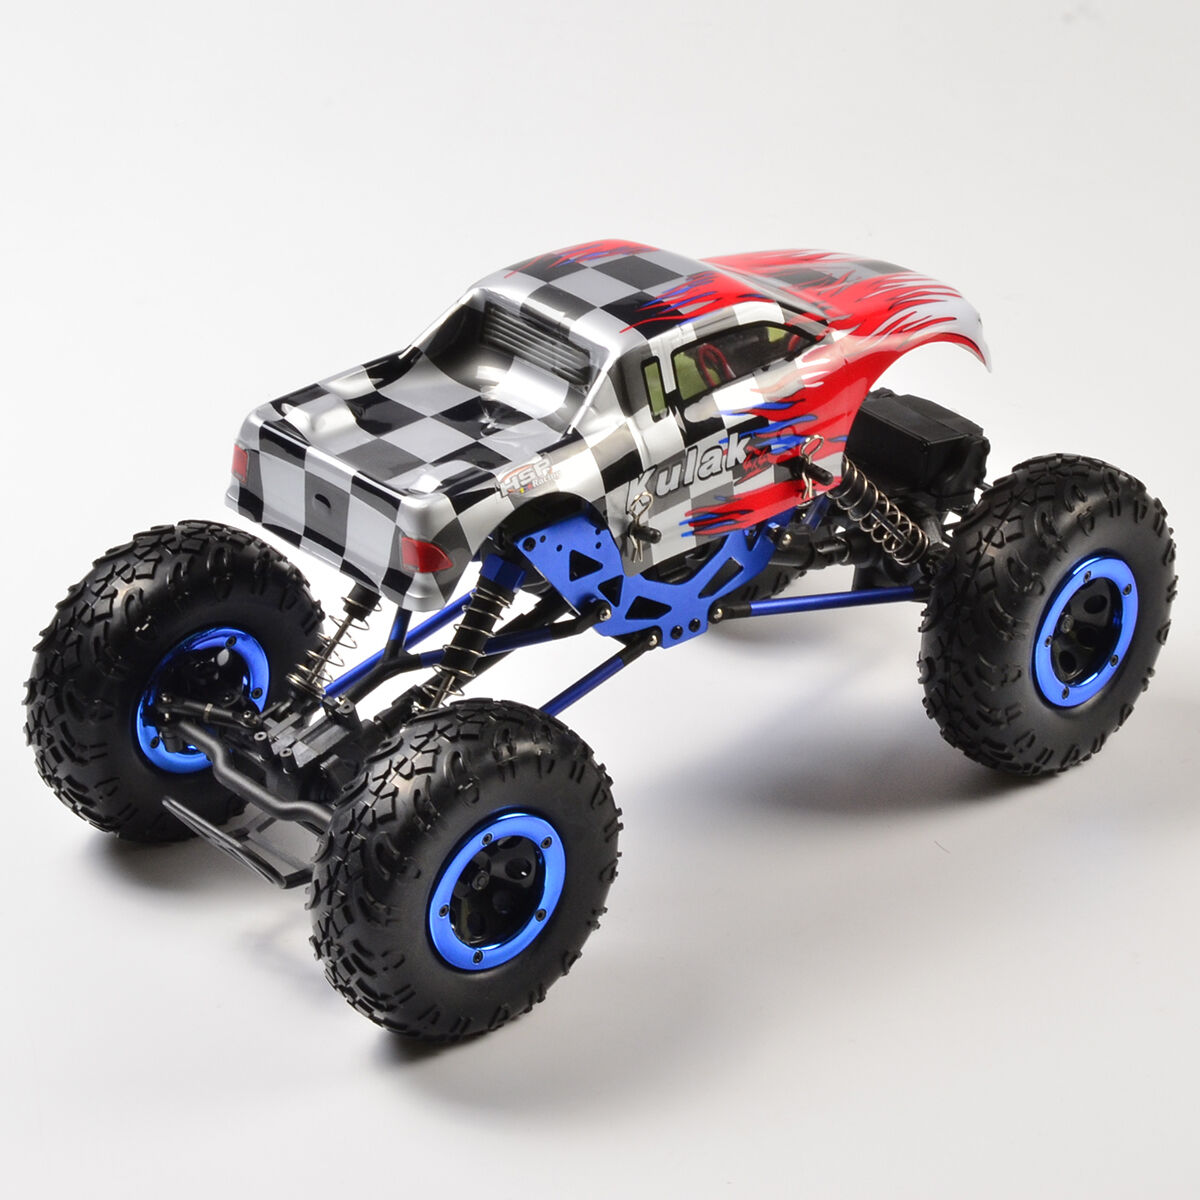 HSP HSP HSP 1 16 4WD Electronic Kulak Mini Rock Crawler escalada RTR RC Coche 94680T3  productos creativos